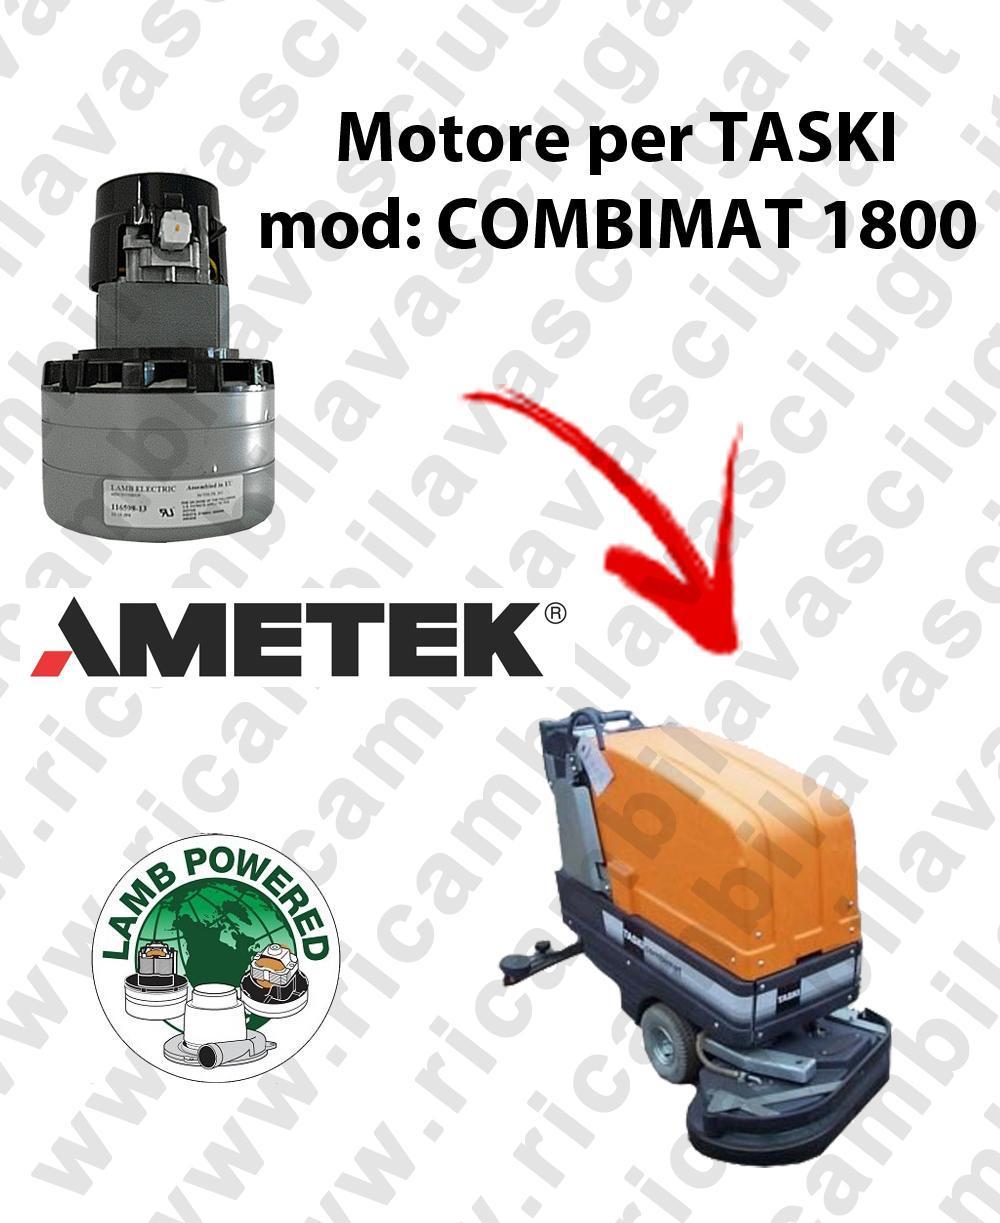 COMBIMAT 1800 Saugmotor LAMB AMETEK für scheuersaugmaschinen TASKI